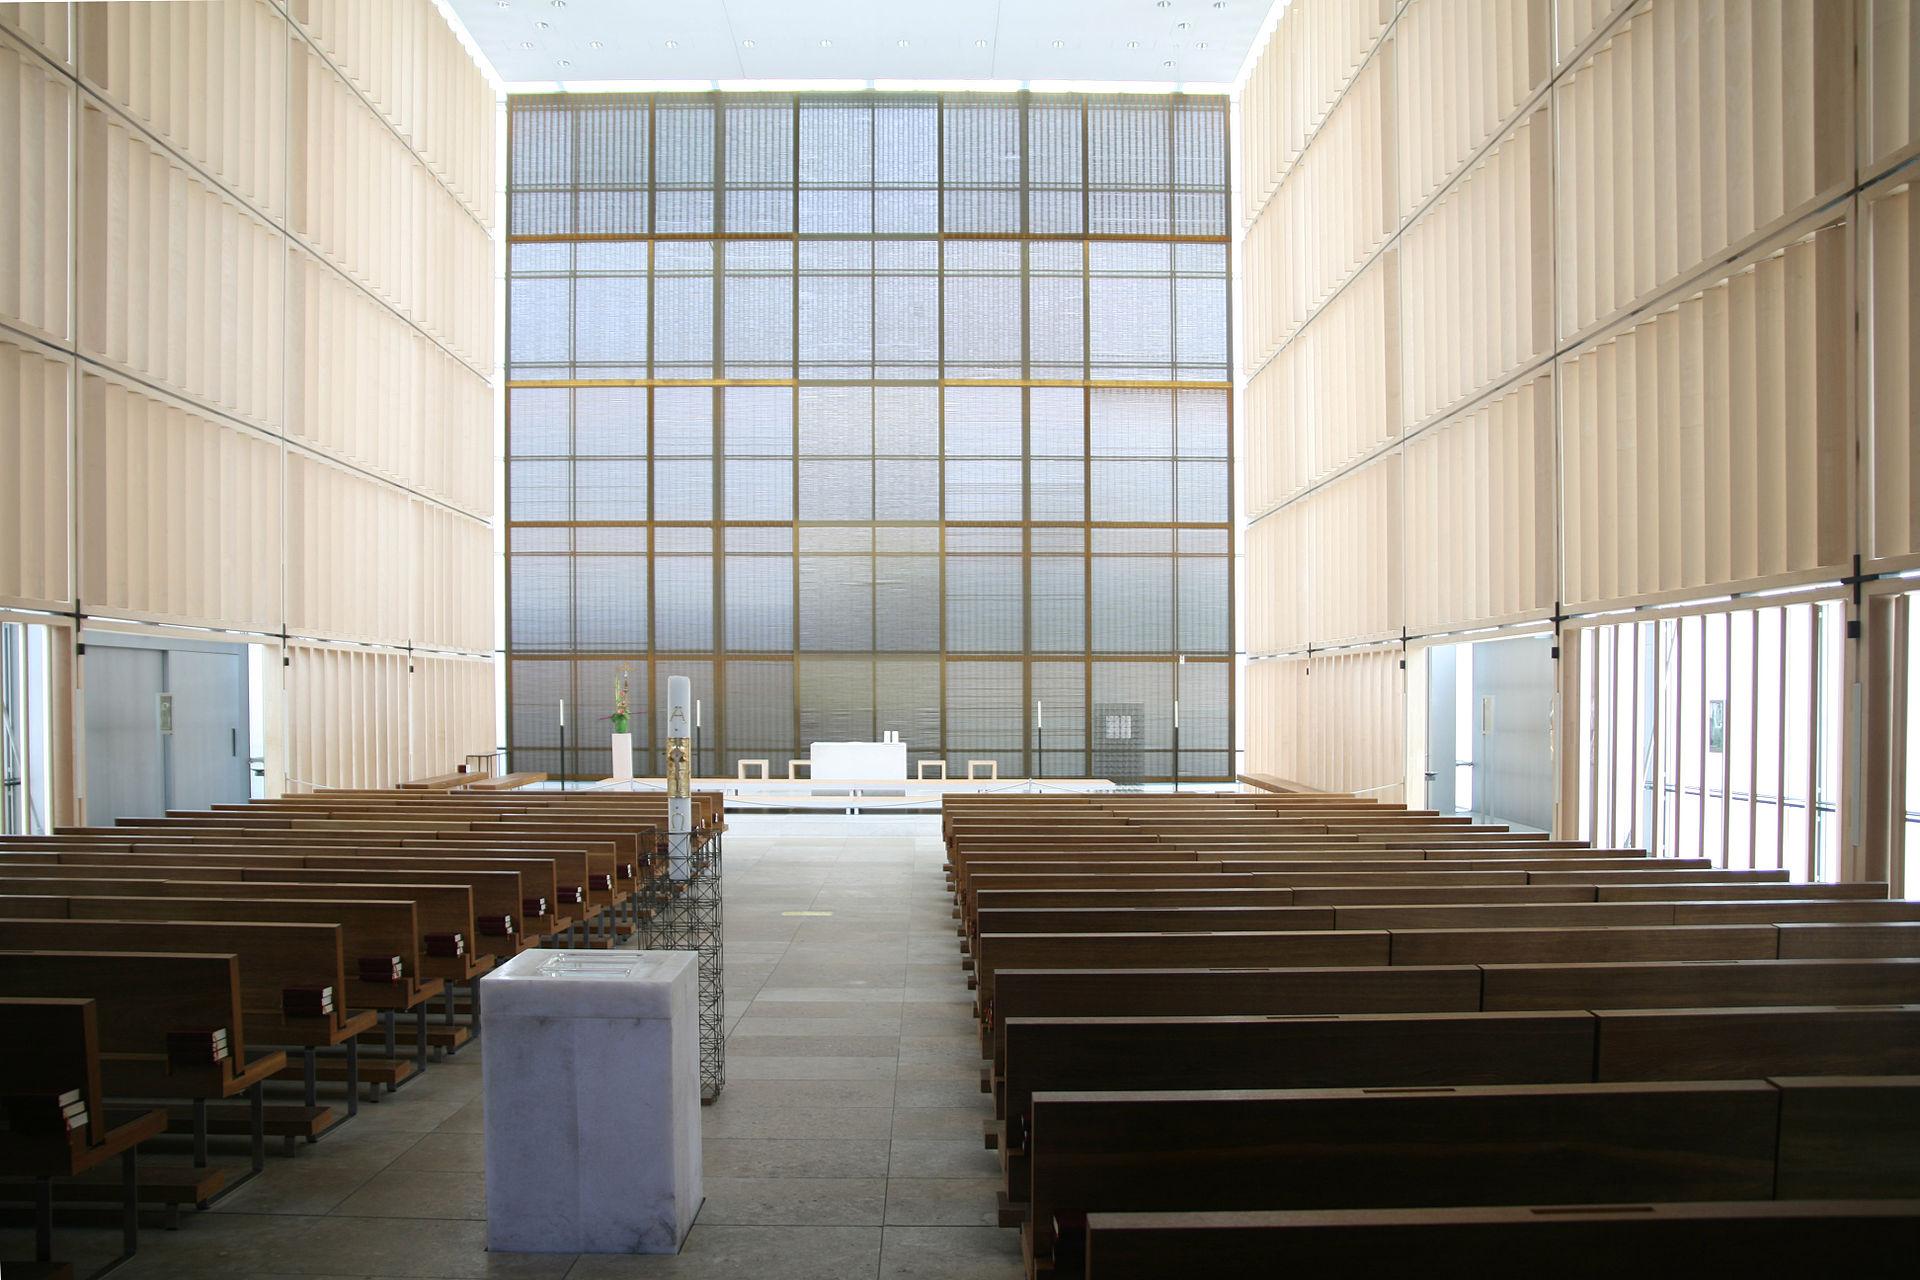 Herz Jesu Kirche in München